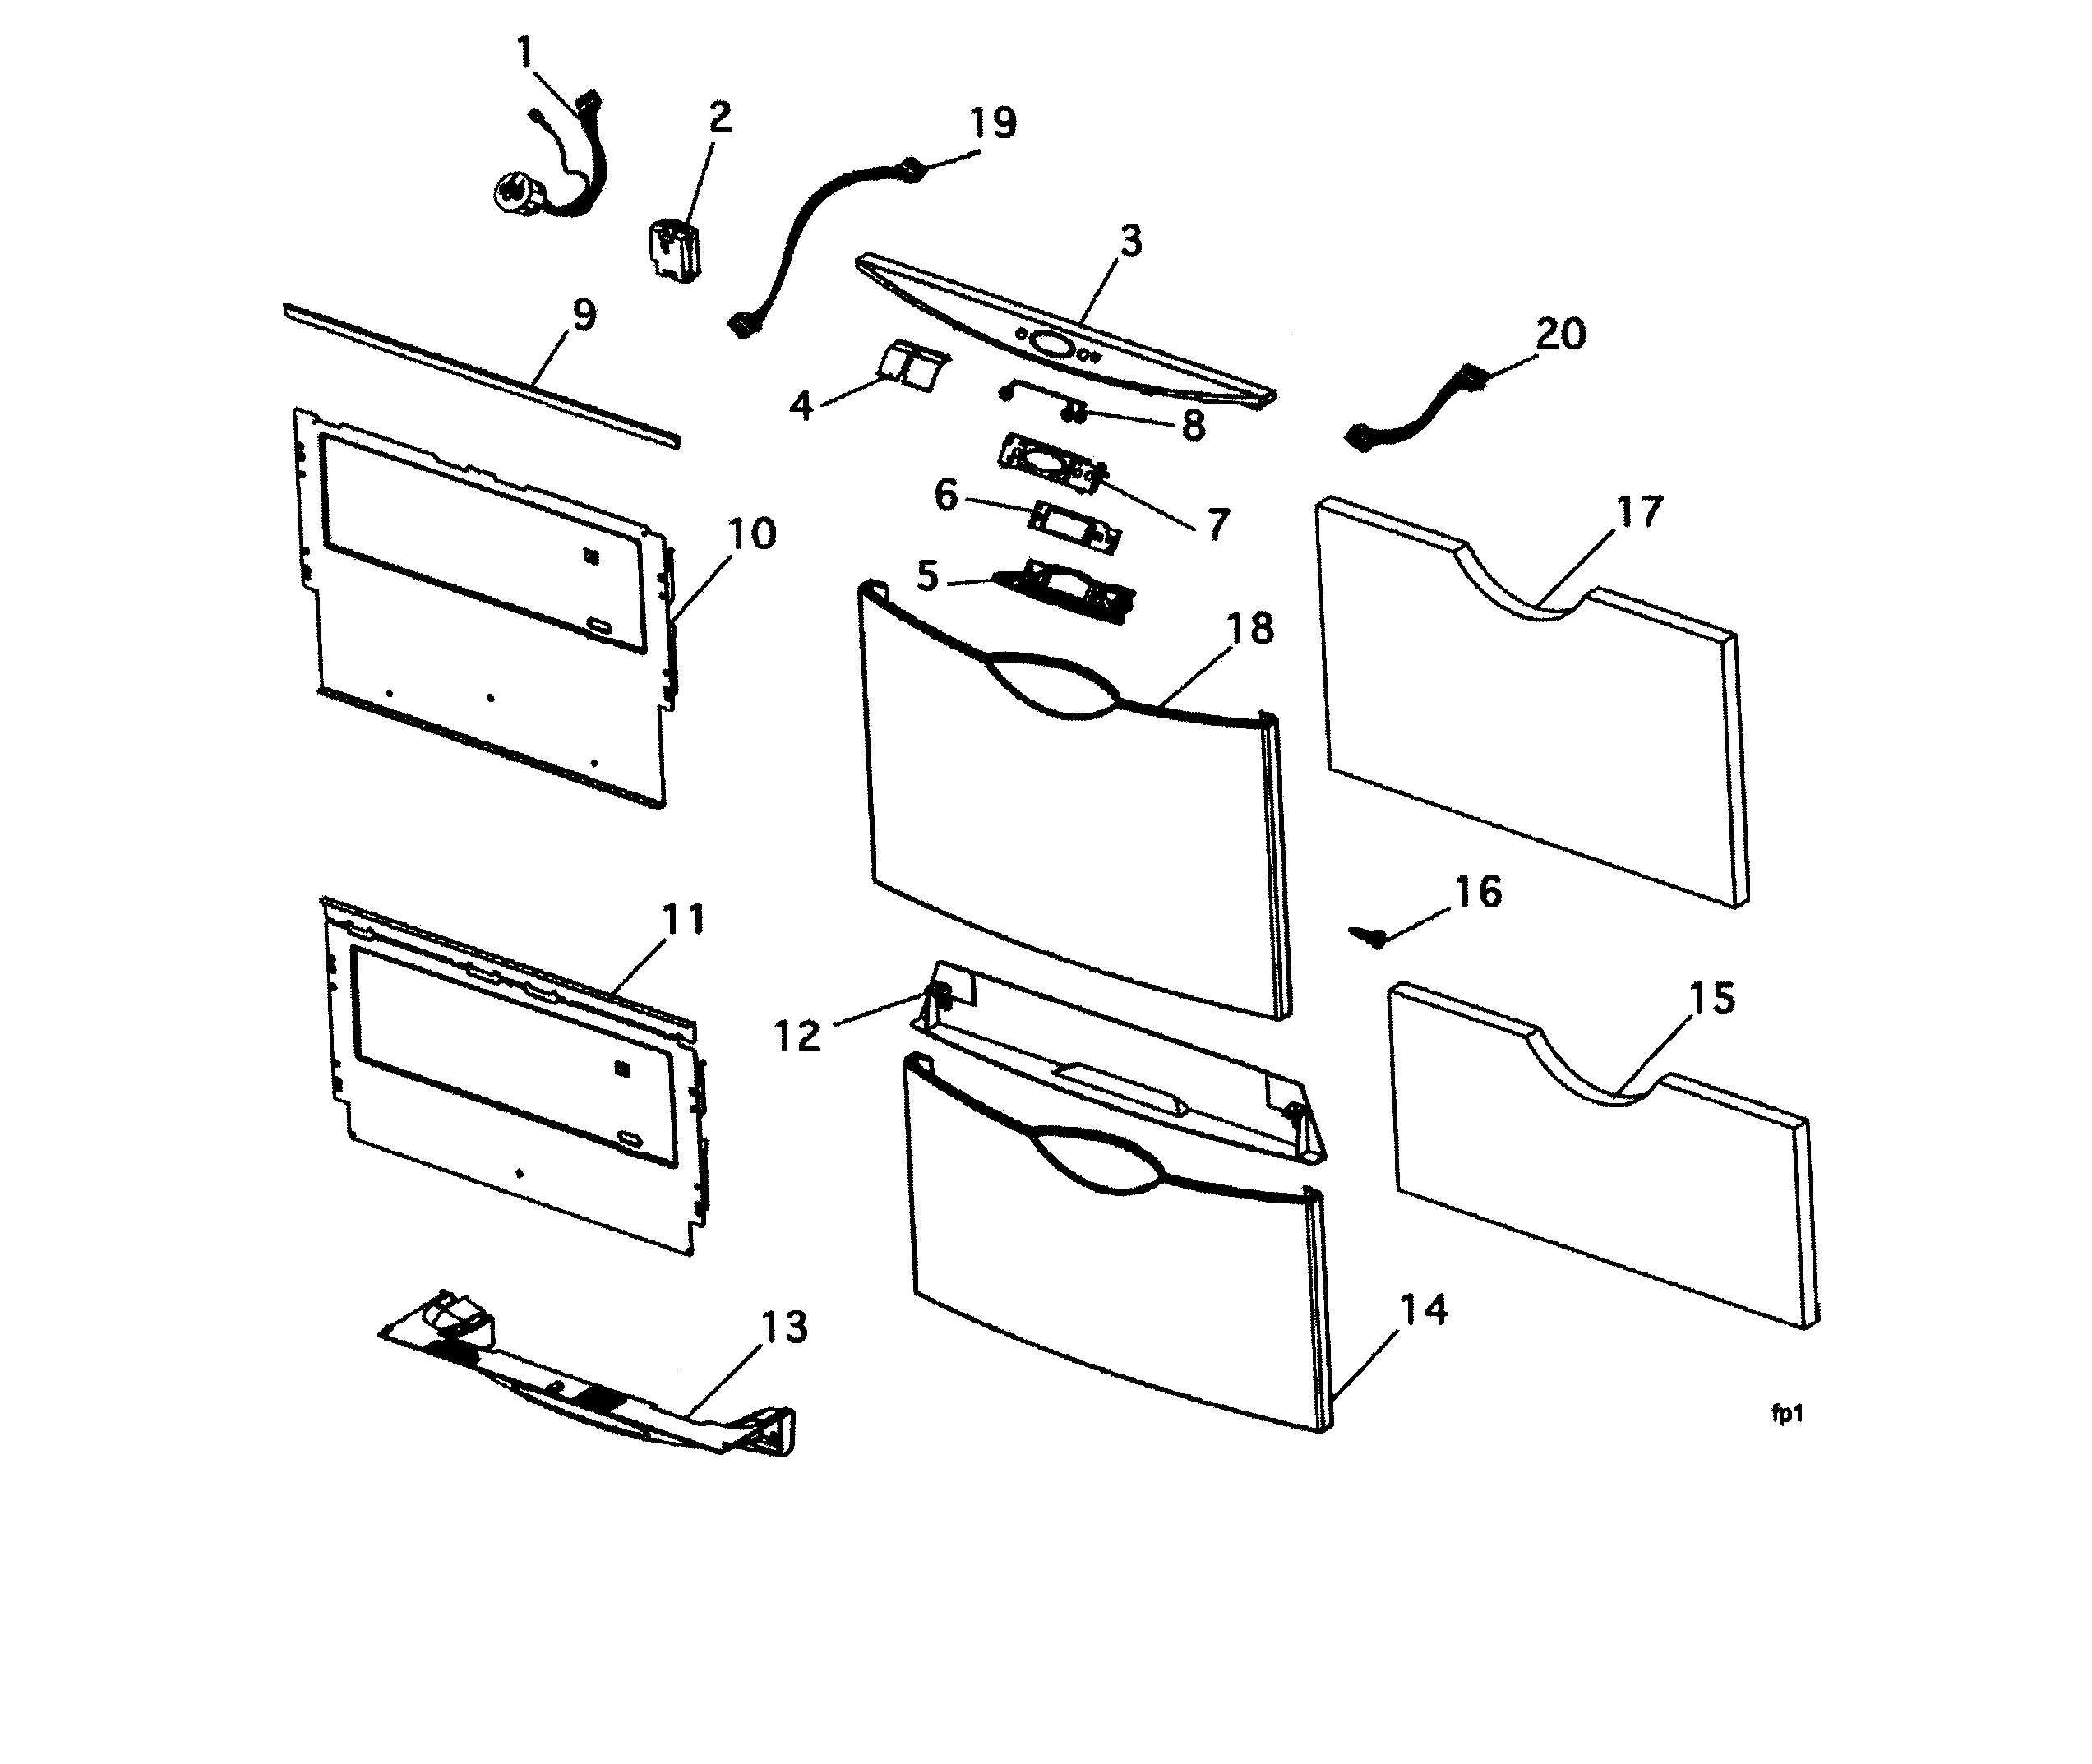 fisher paykel washing machine parts diagram honda activa electrical wiring ppt fisherpaykel dishwasher model dd60388445 sears